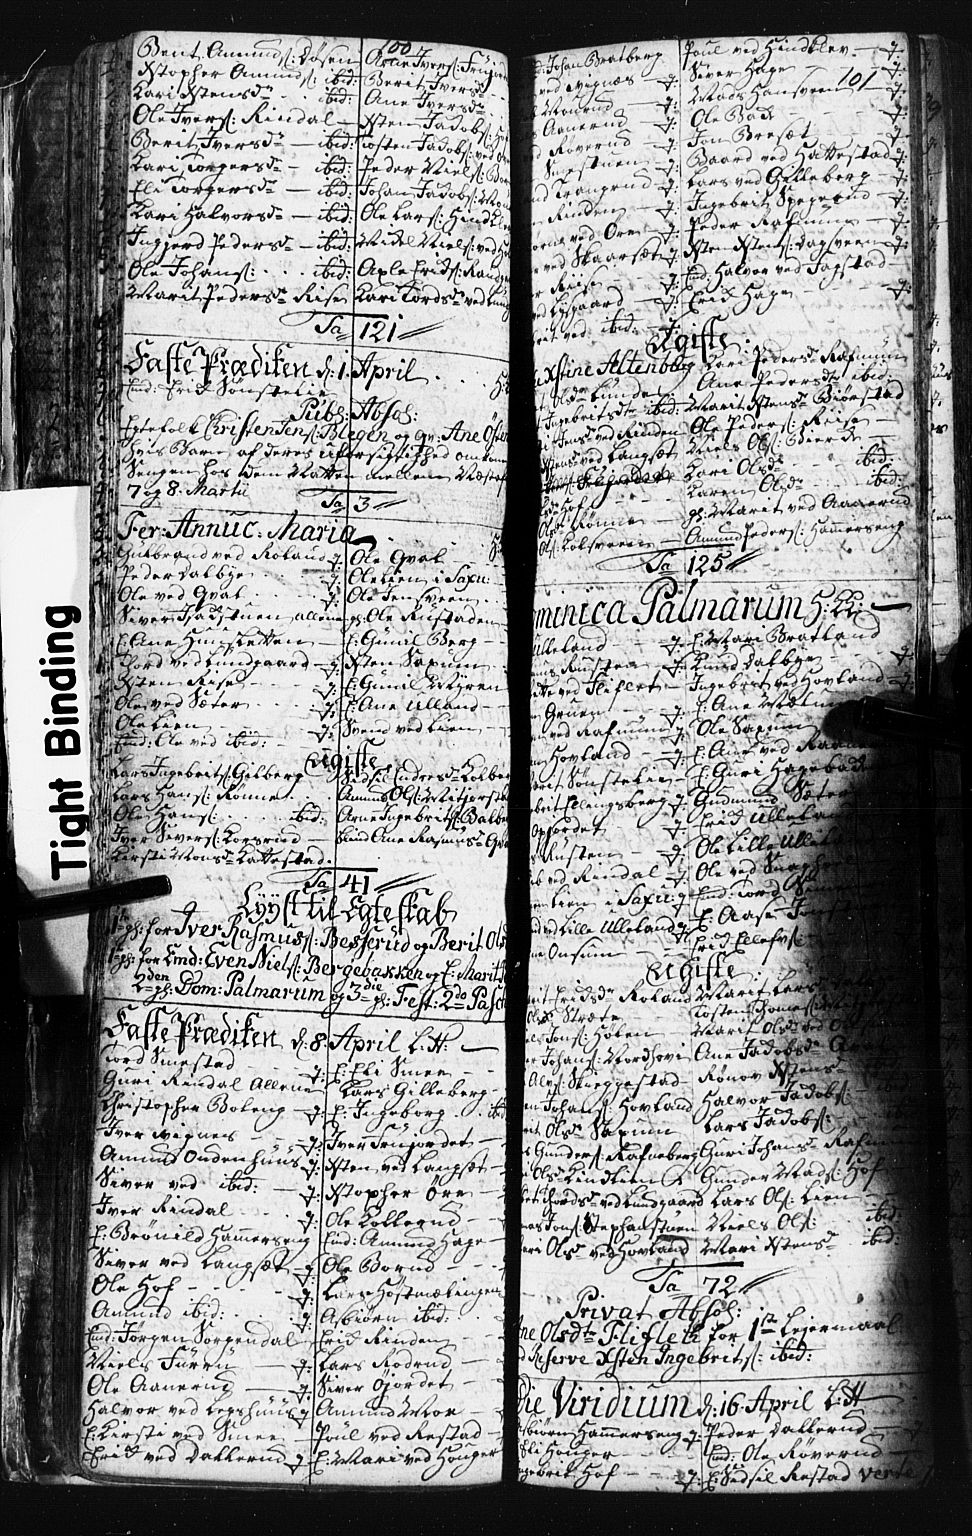 SAH, Fåberg prestekontor, Klokkerbok nr. 3, 1768-1796, s. 100-101